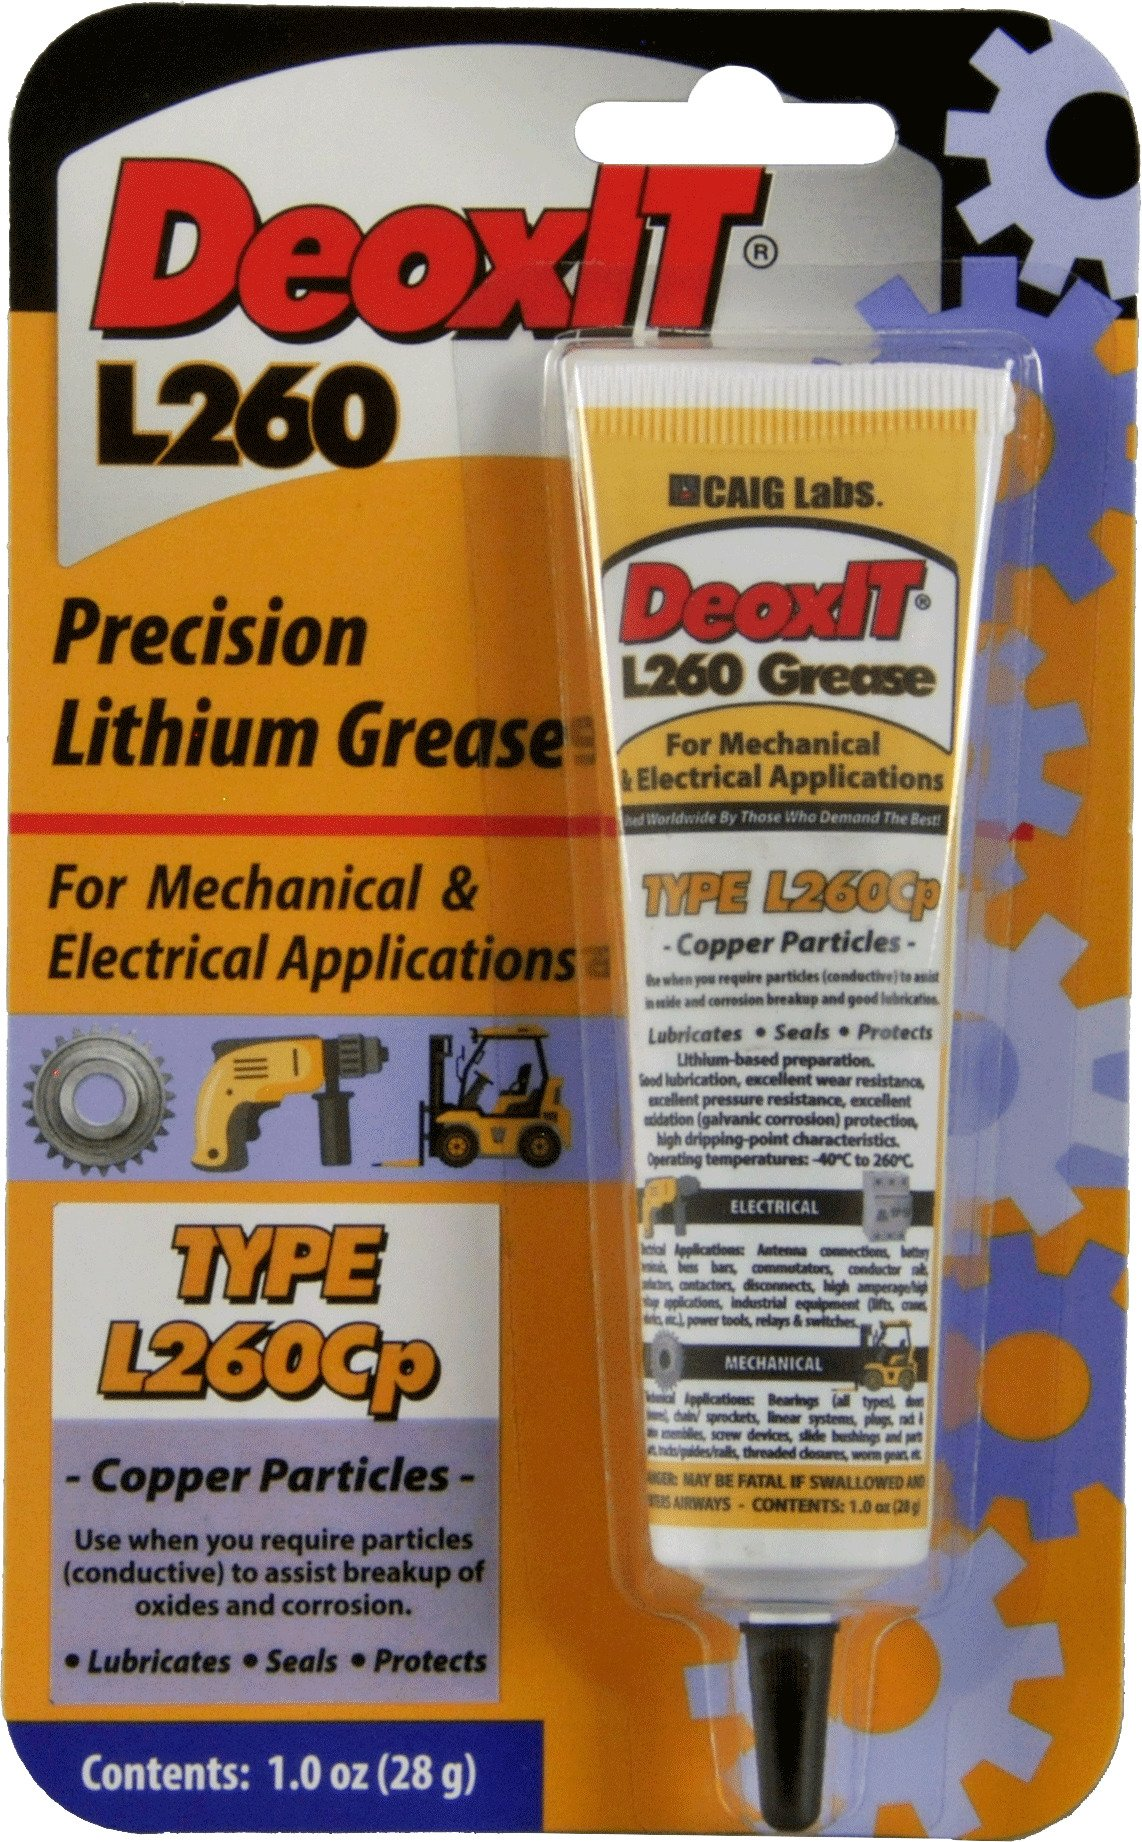 DeoxIT L260 Grease L260Cp, Tube copper particles 28 g - L260-C1 by CAIG Laboratories (Image #2)